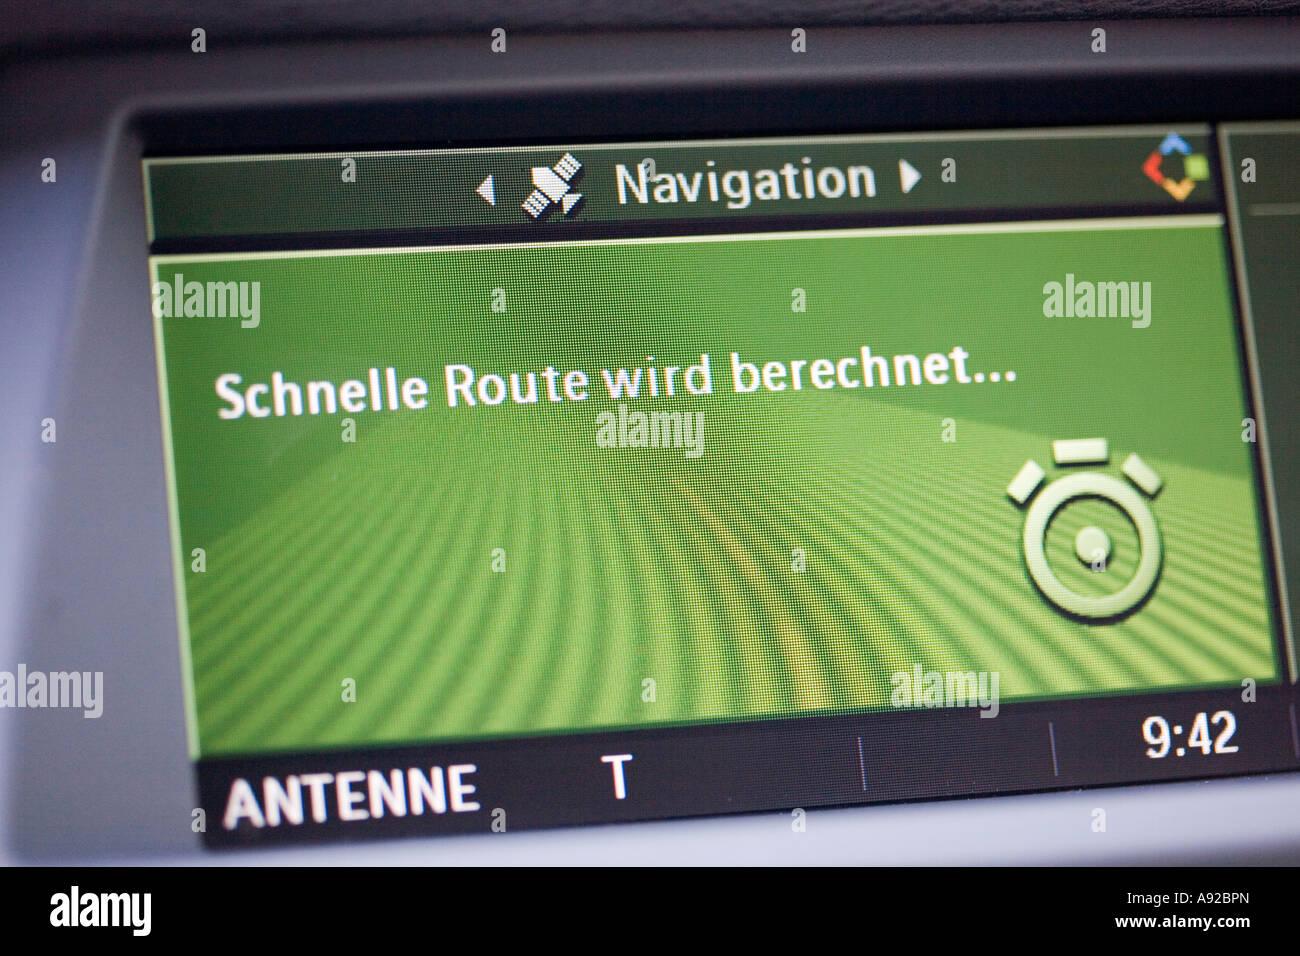 Navigation system - Stock Image